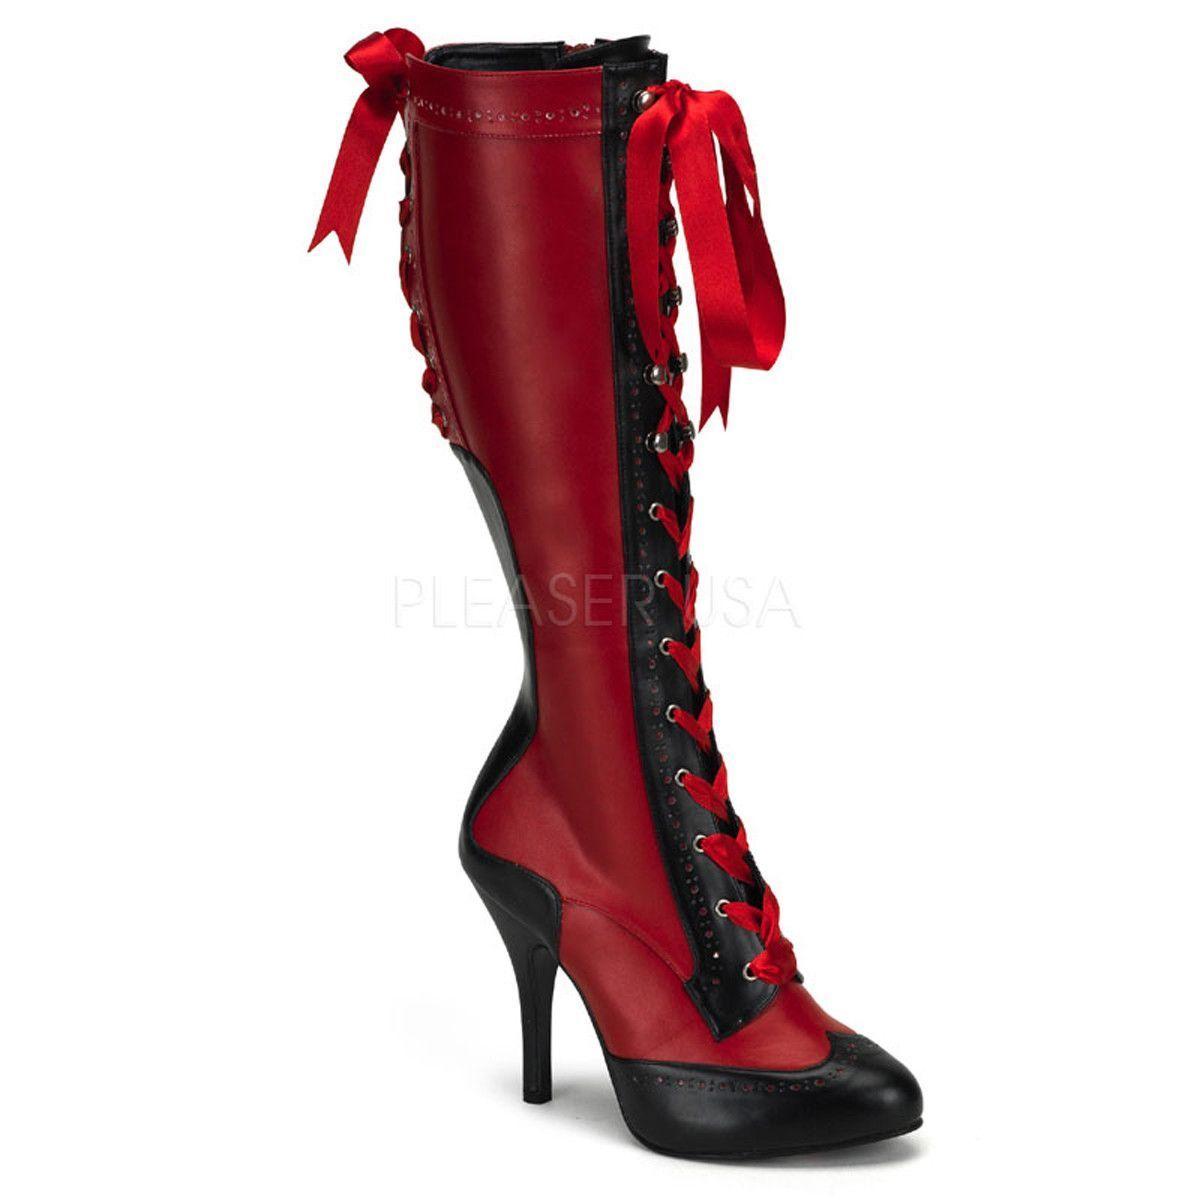 3fd7c0aa942d9 PL - Sklep z butami PLEASER - high heels, kozaczki, klapi, sandałki, buty  damskie - TEMPT-125 | shoes / buty | Women's lace up boots, Shoe boots i  High …